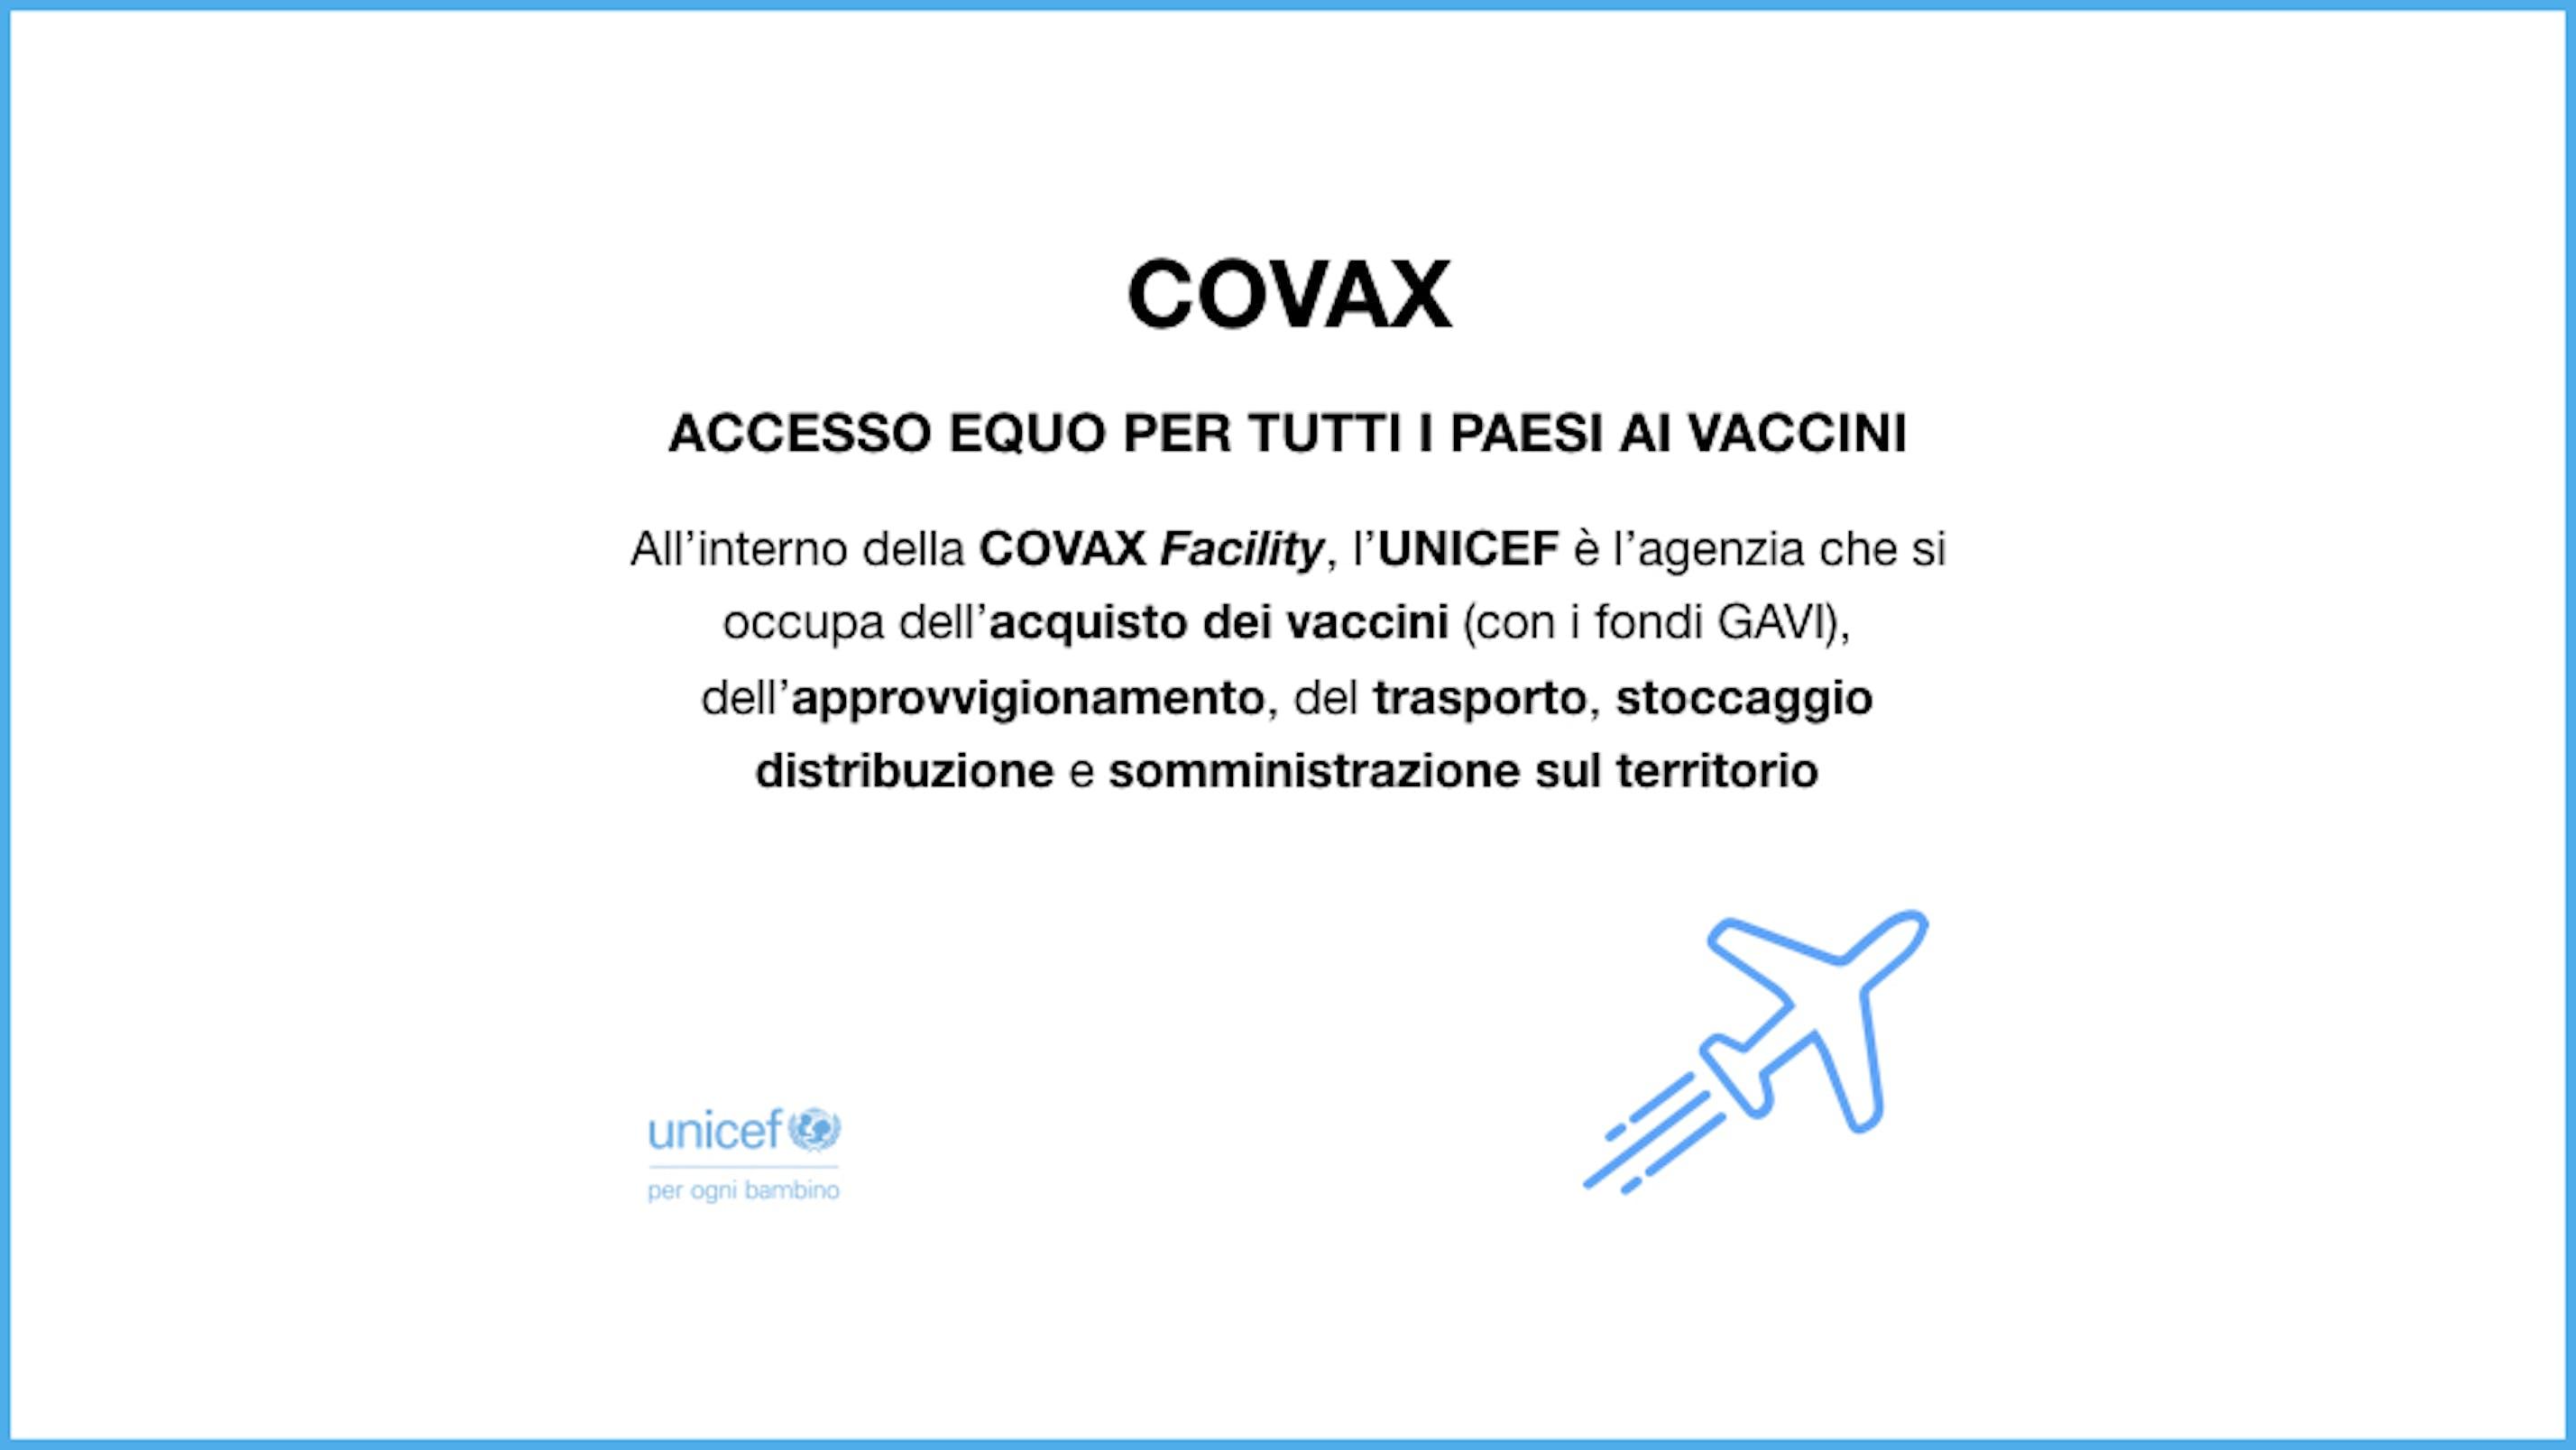 Covax 5